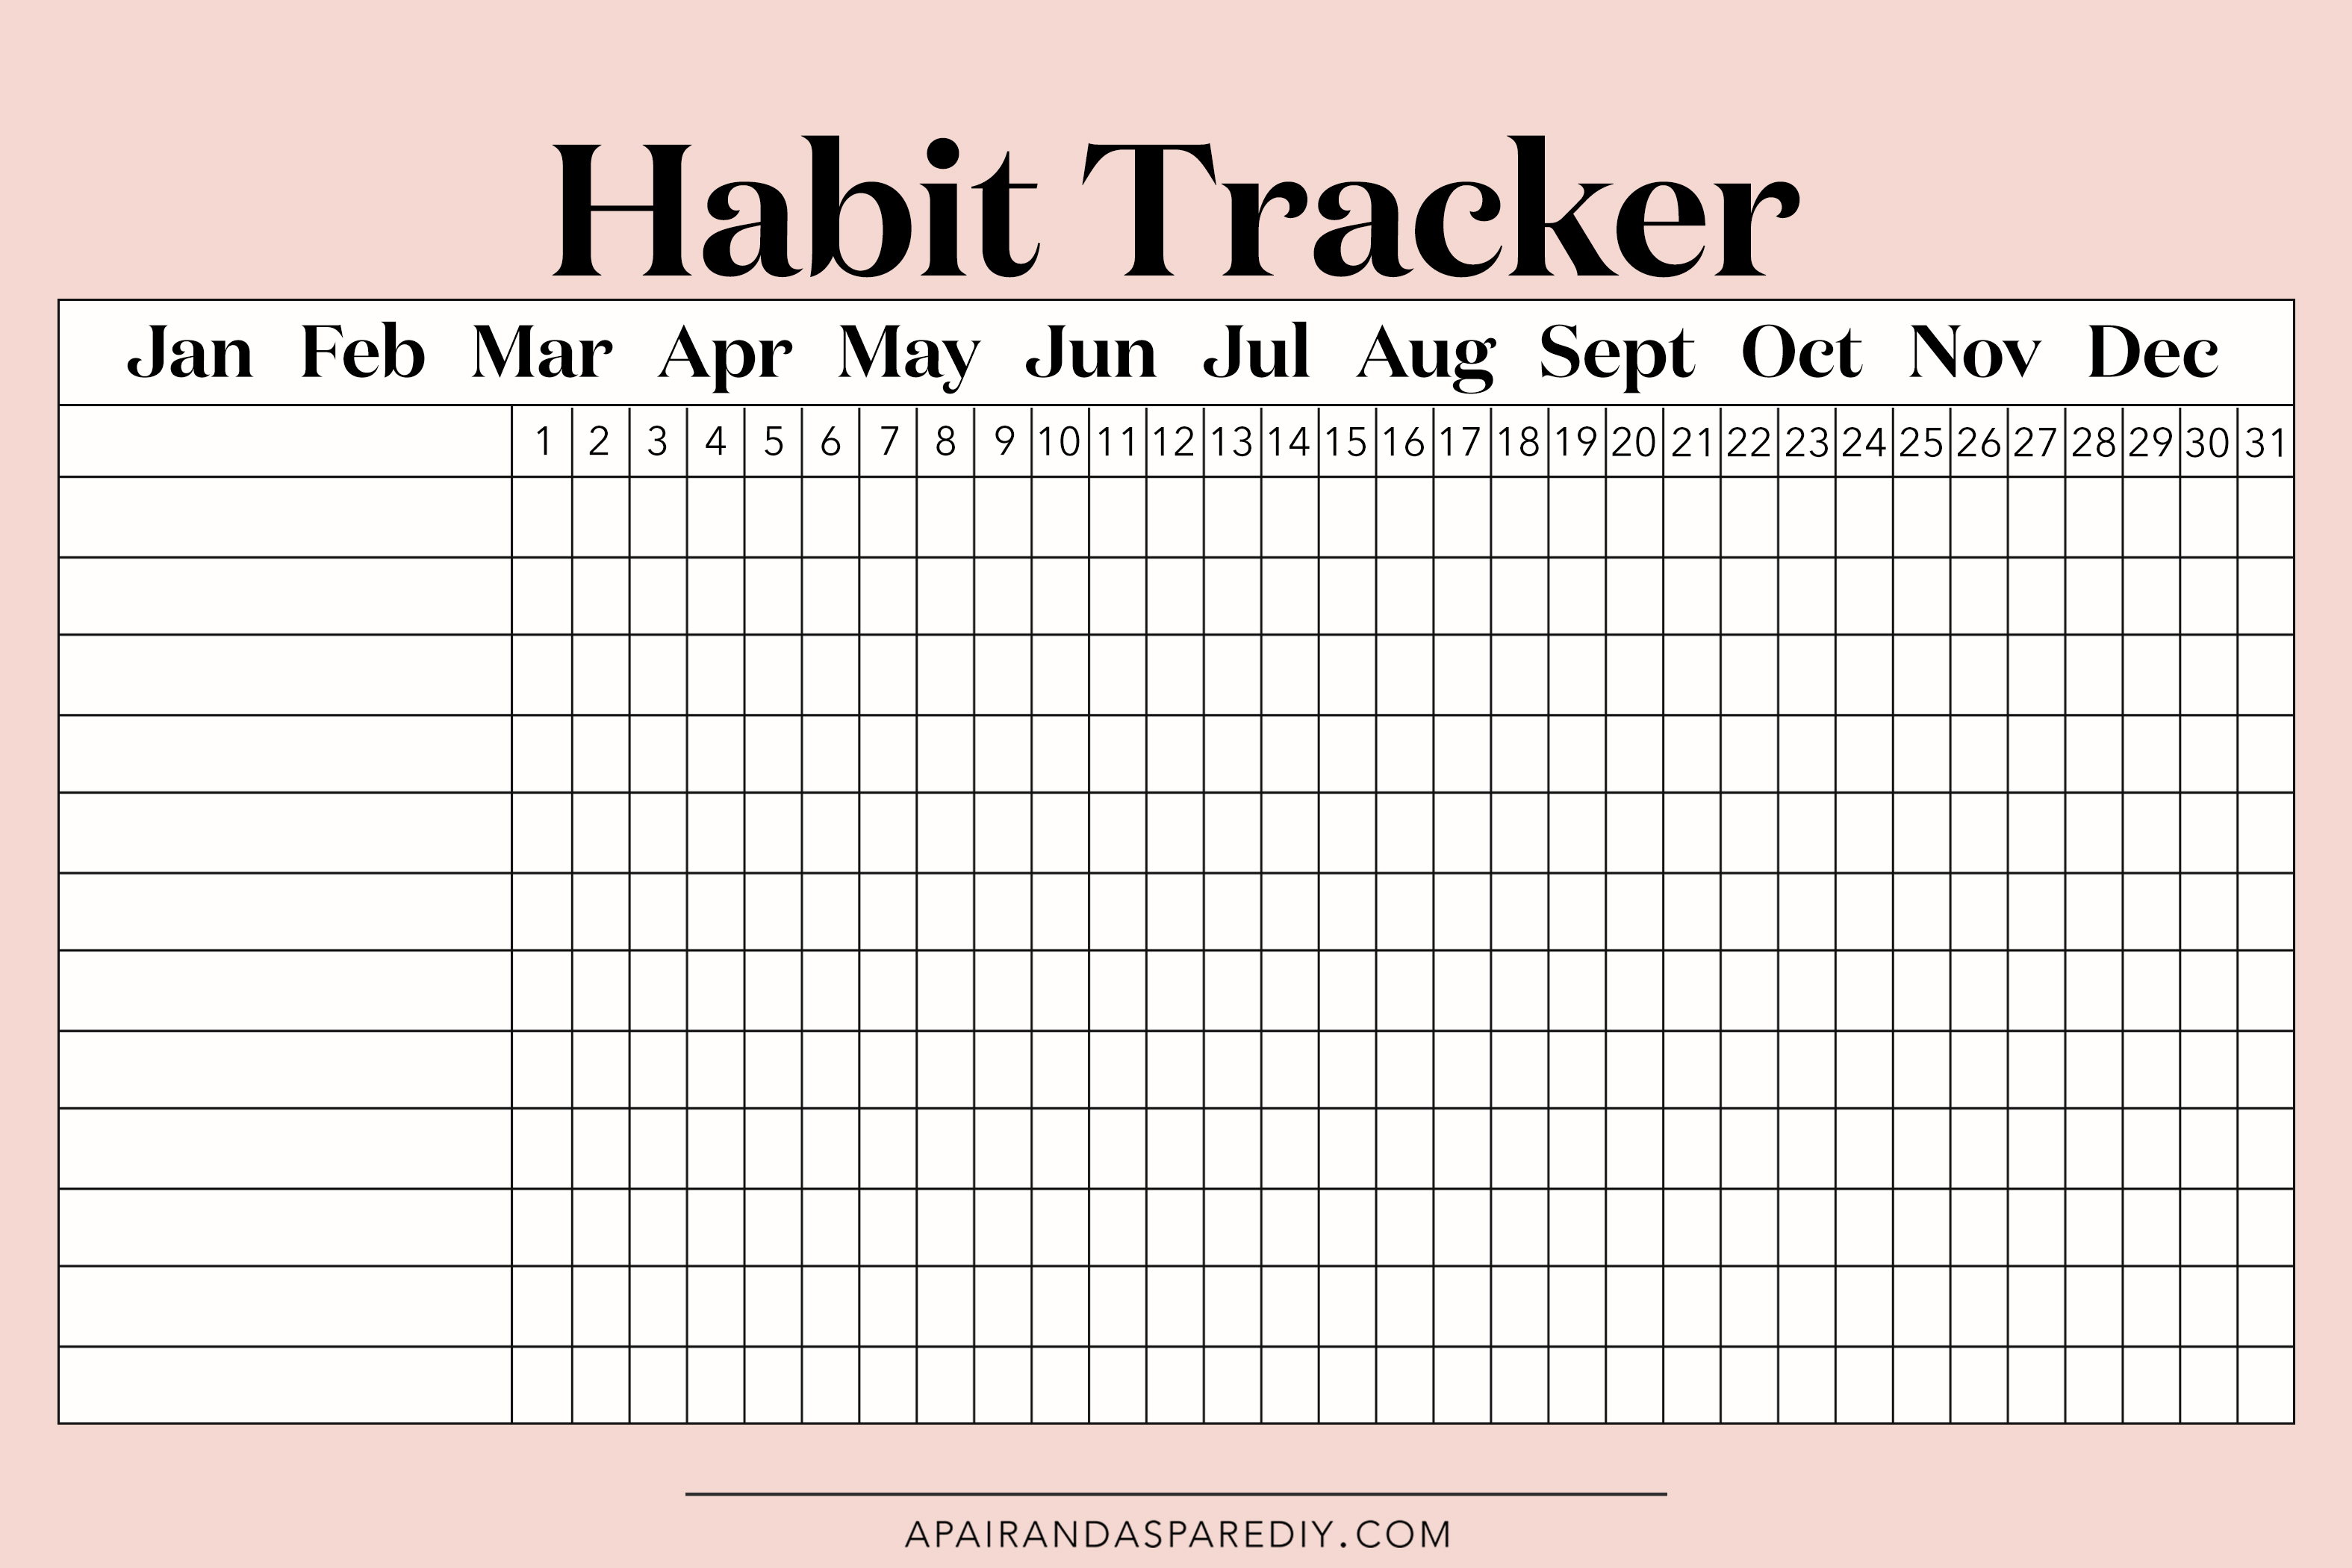 Simple Ways To Adopt Healthy Habits Salma S Lifestyle